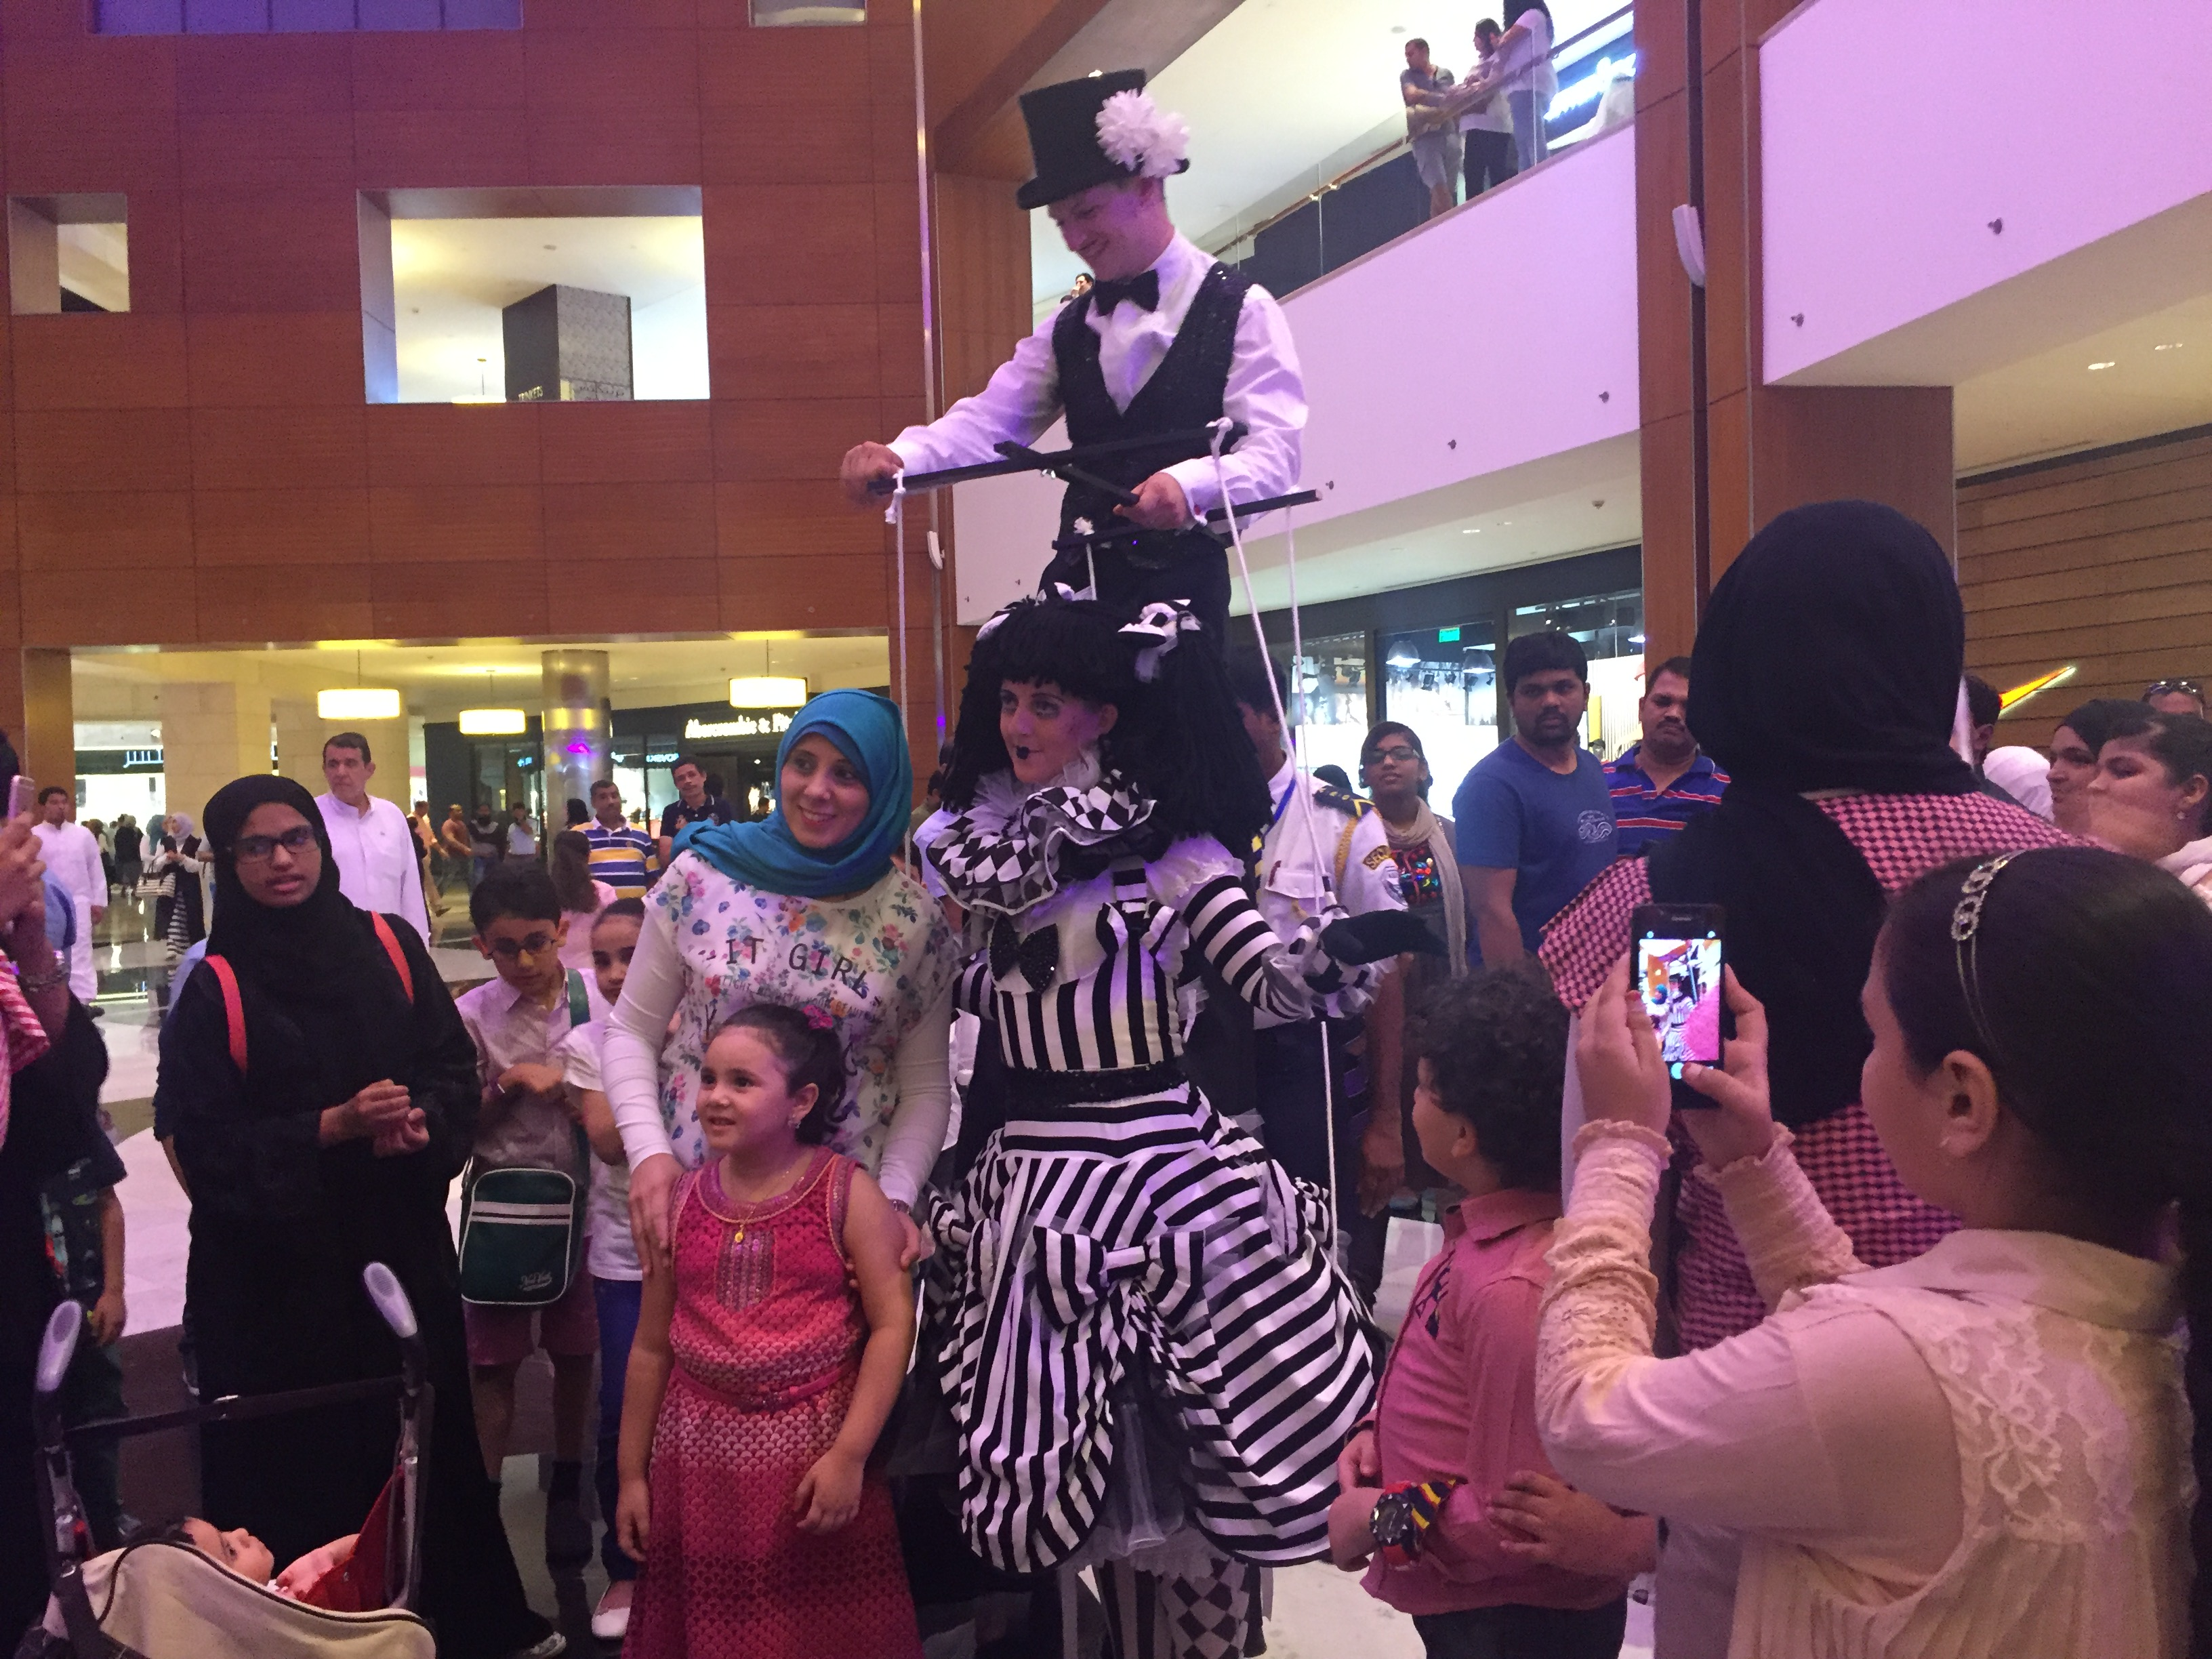 Marionette Puppet Master Stripes